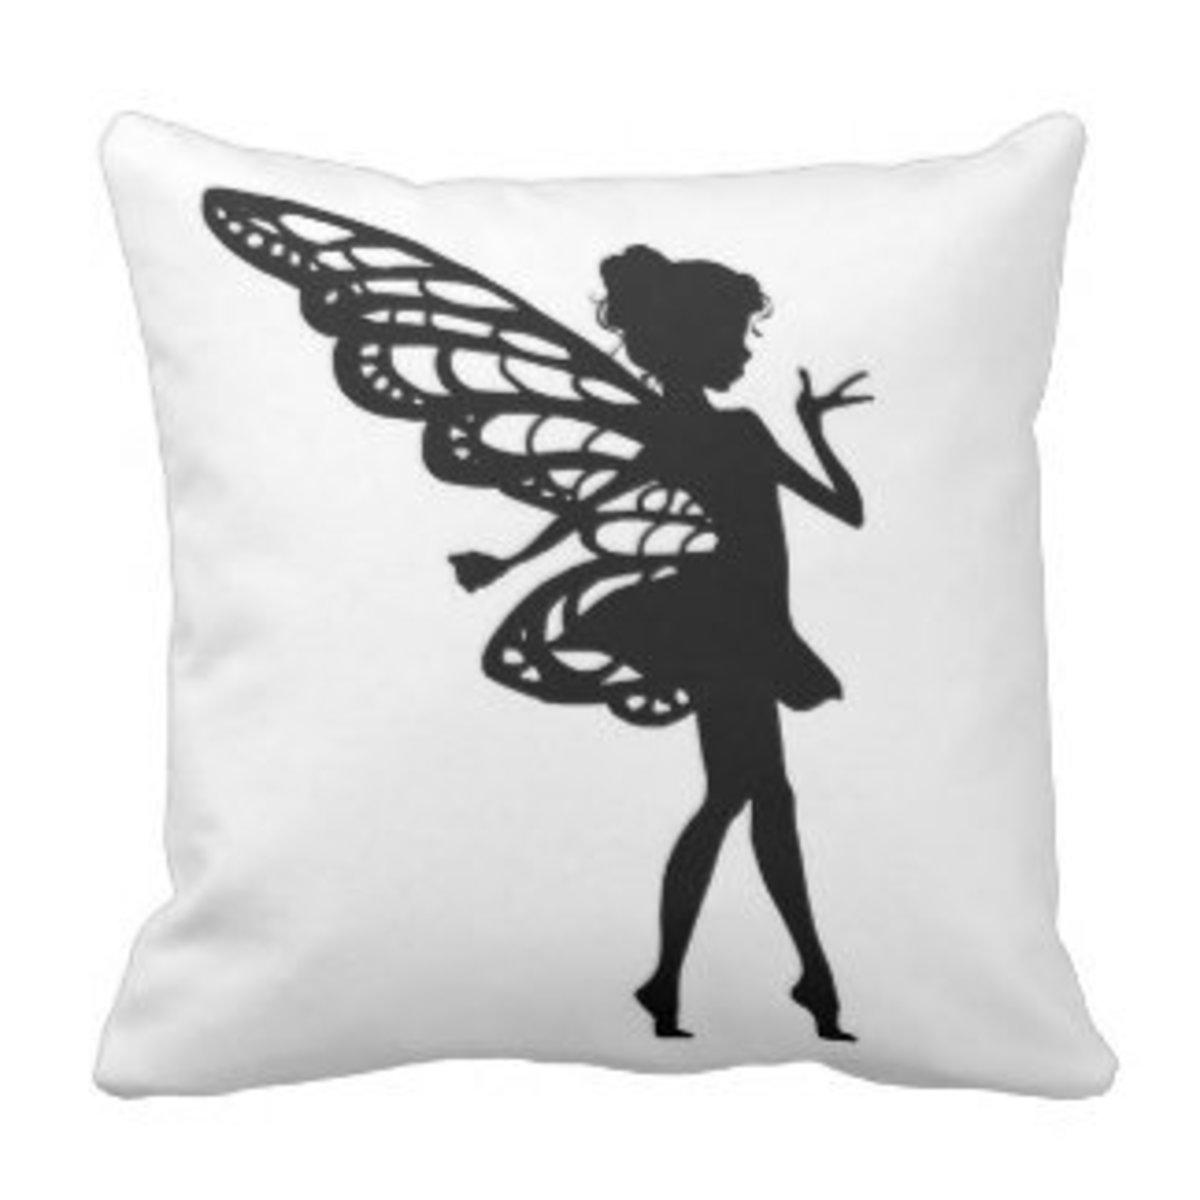 Fairy Silhouette Pillow